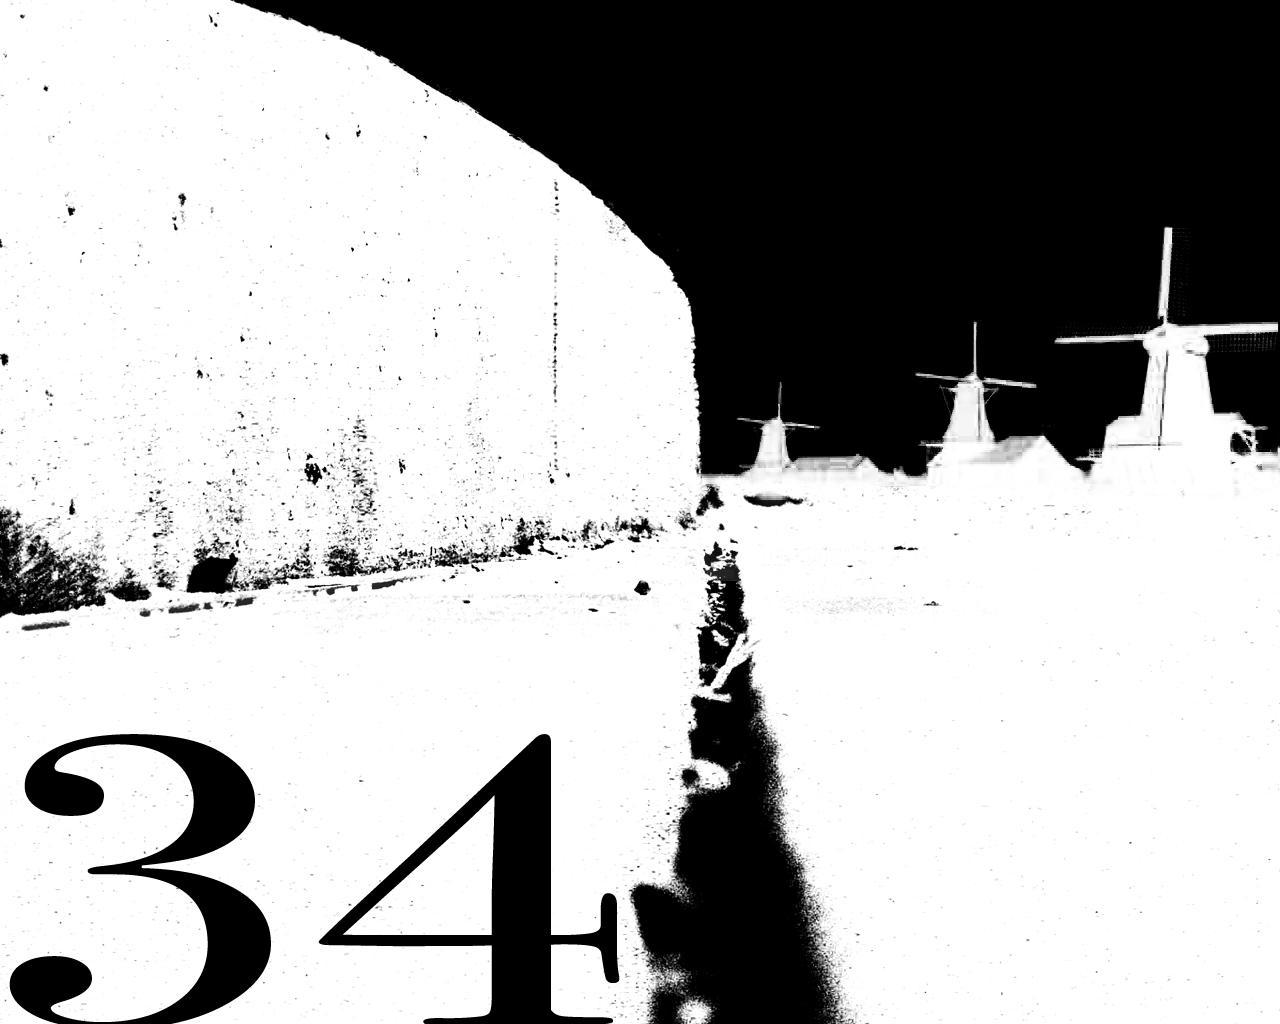 34 by kenji2030